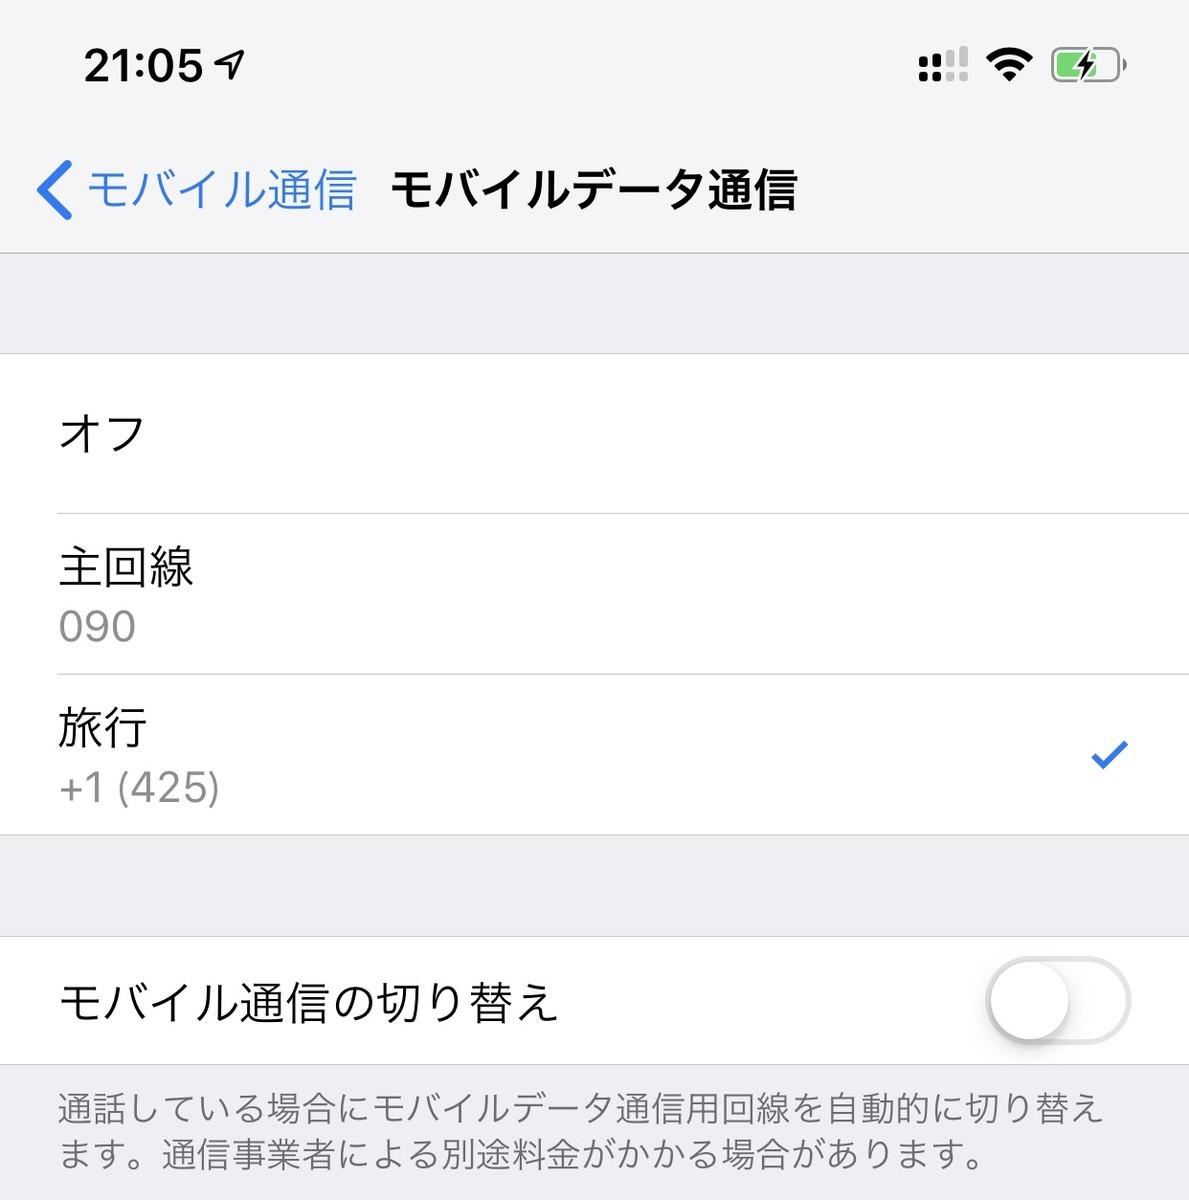 f:id:shiba-yan:20190327103404j:plain:w550